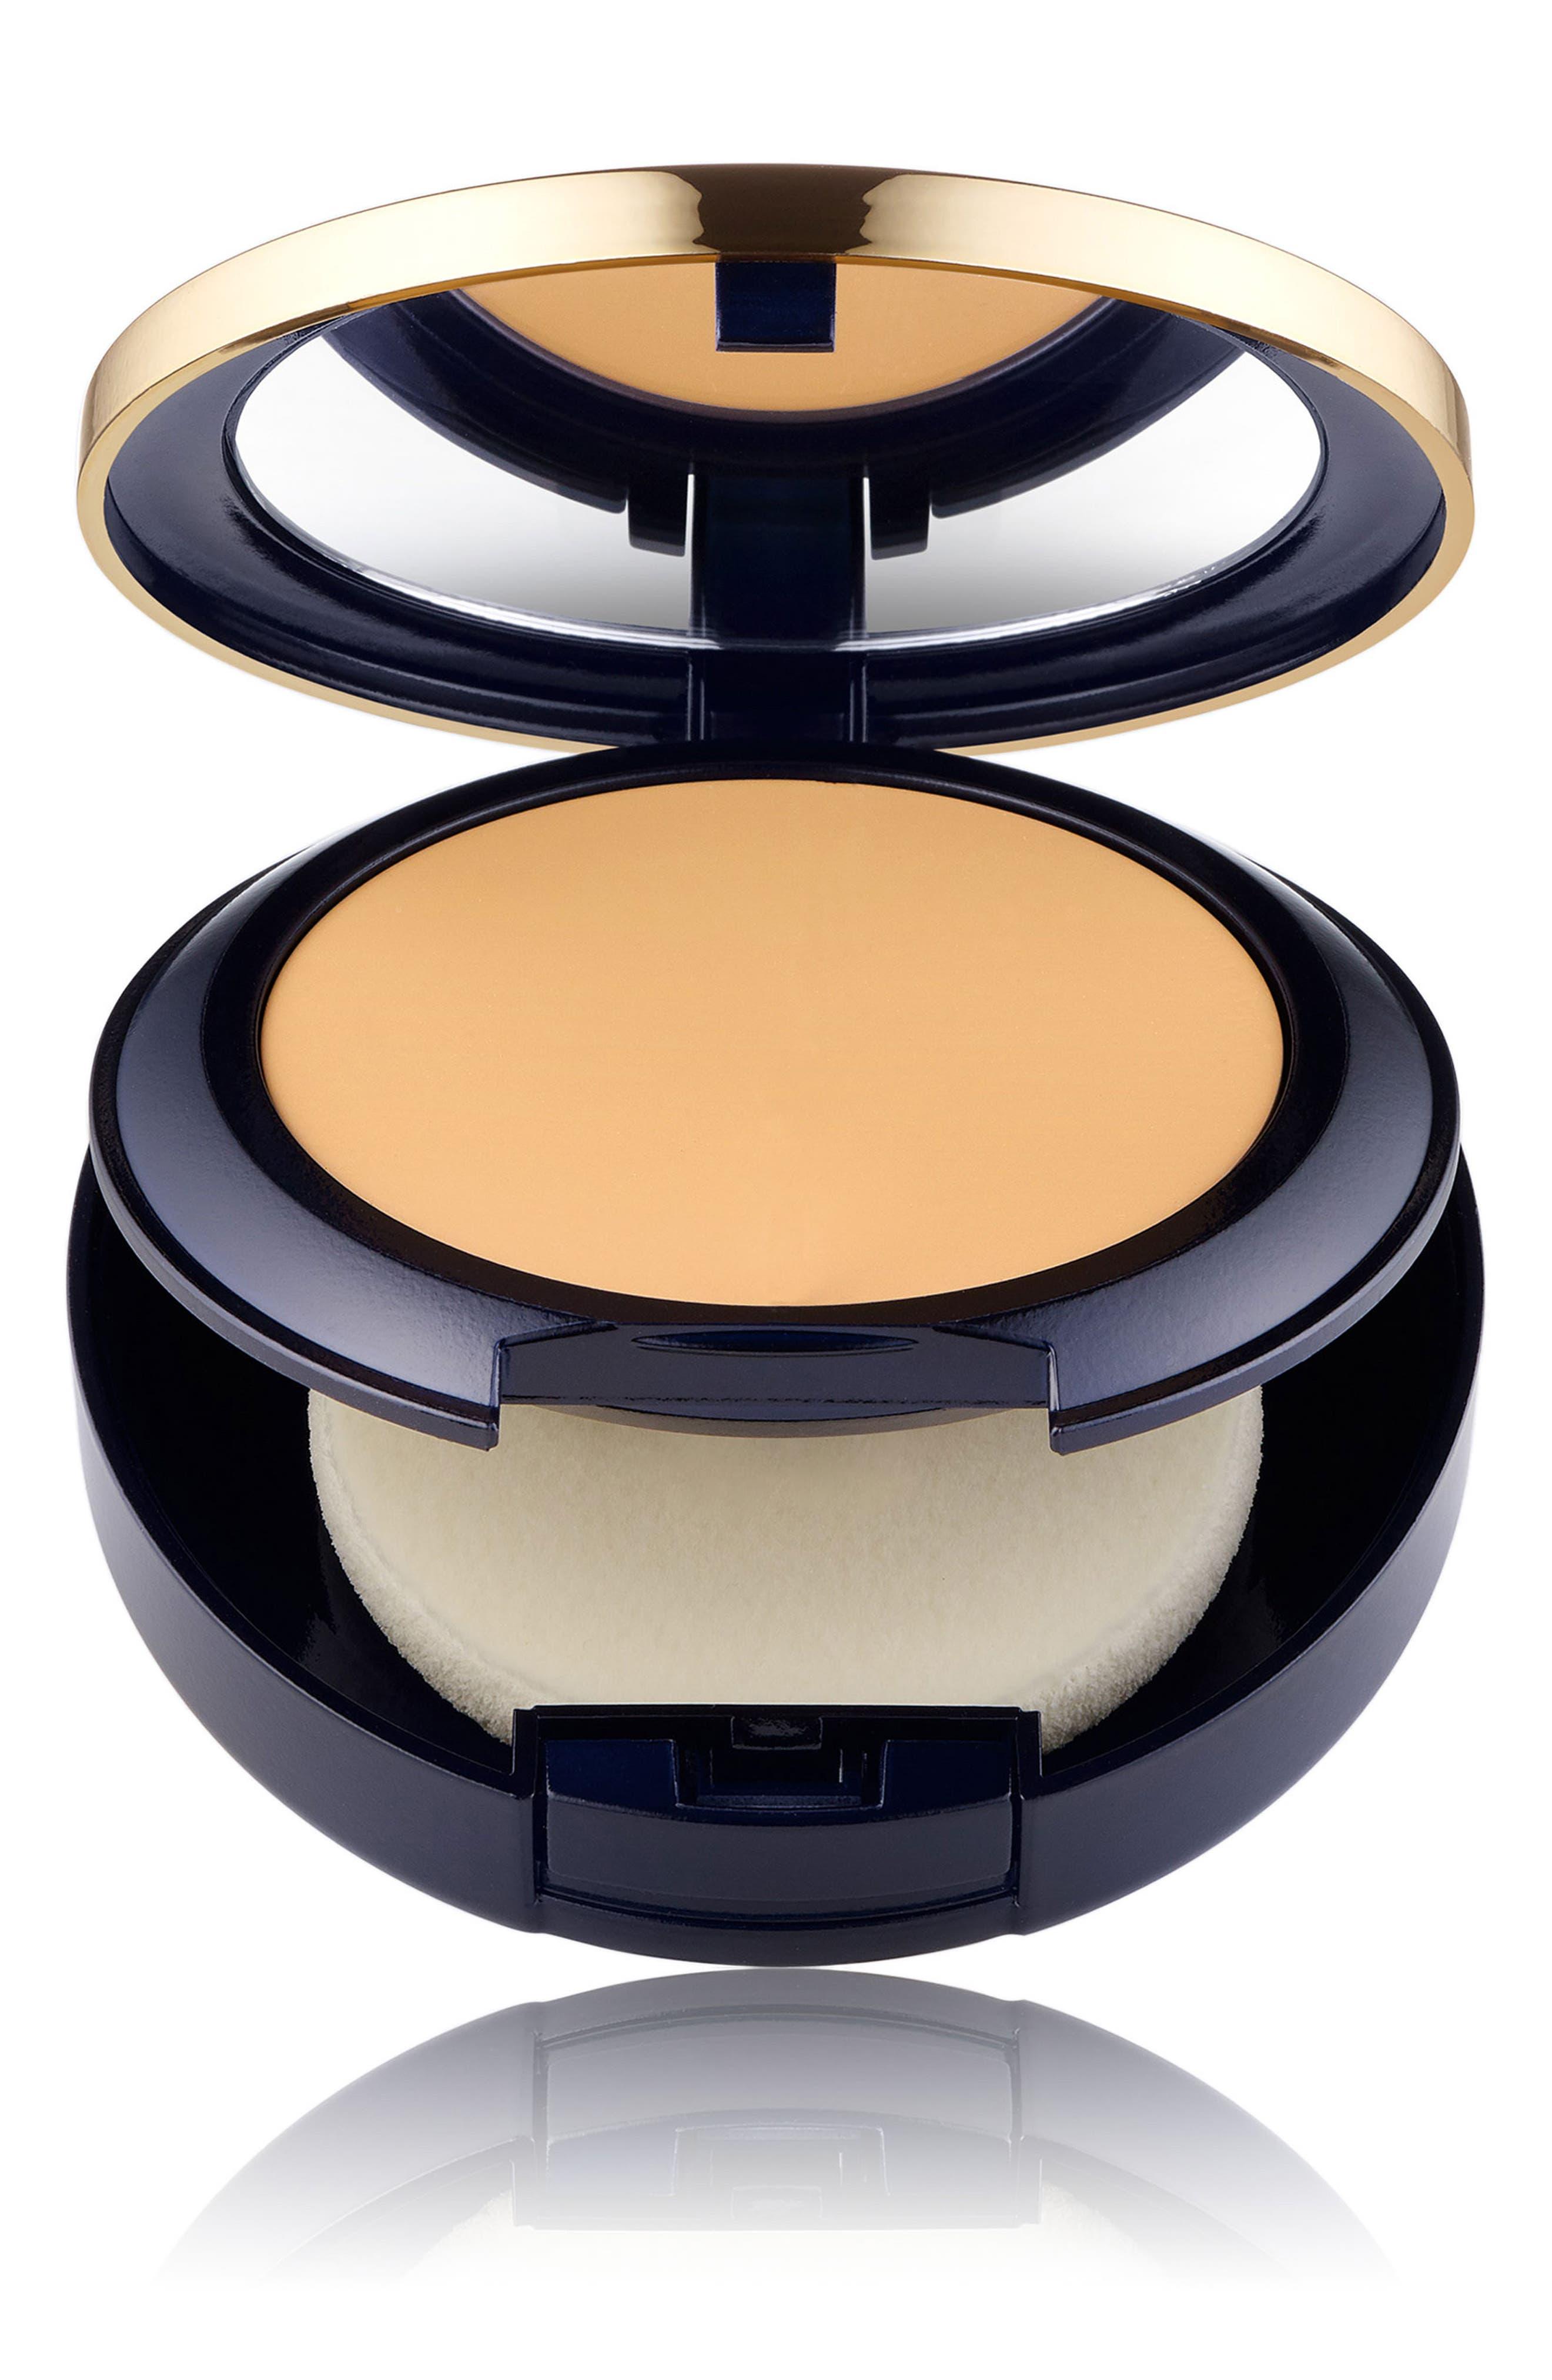 Estee Lauder Double Wear Stay In Place Matte Powder Foundation - 1 Honey Bronze